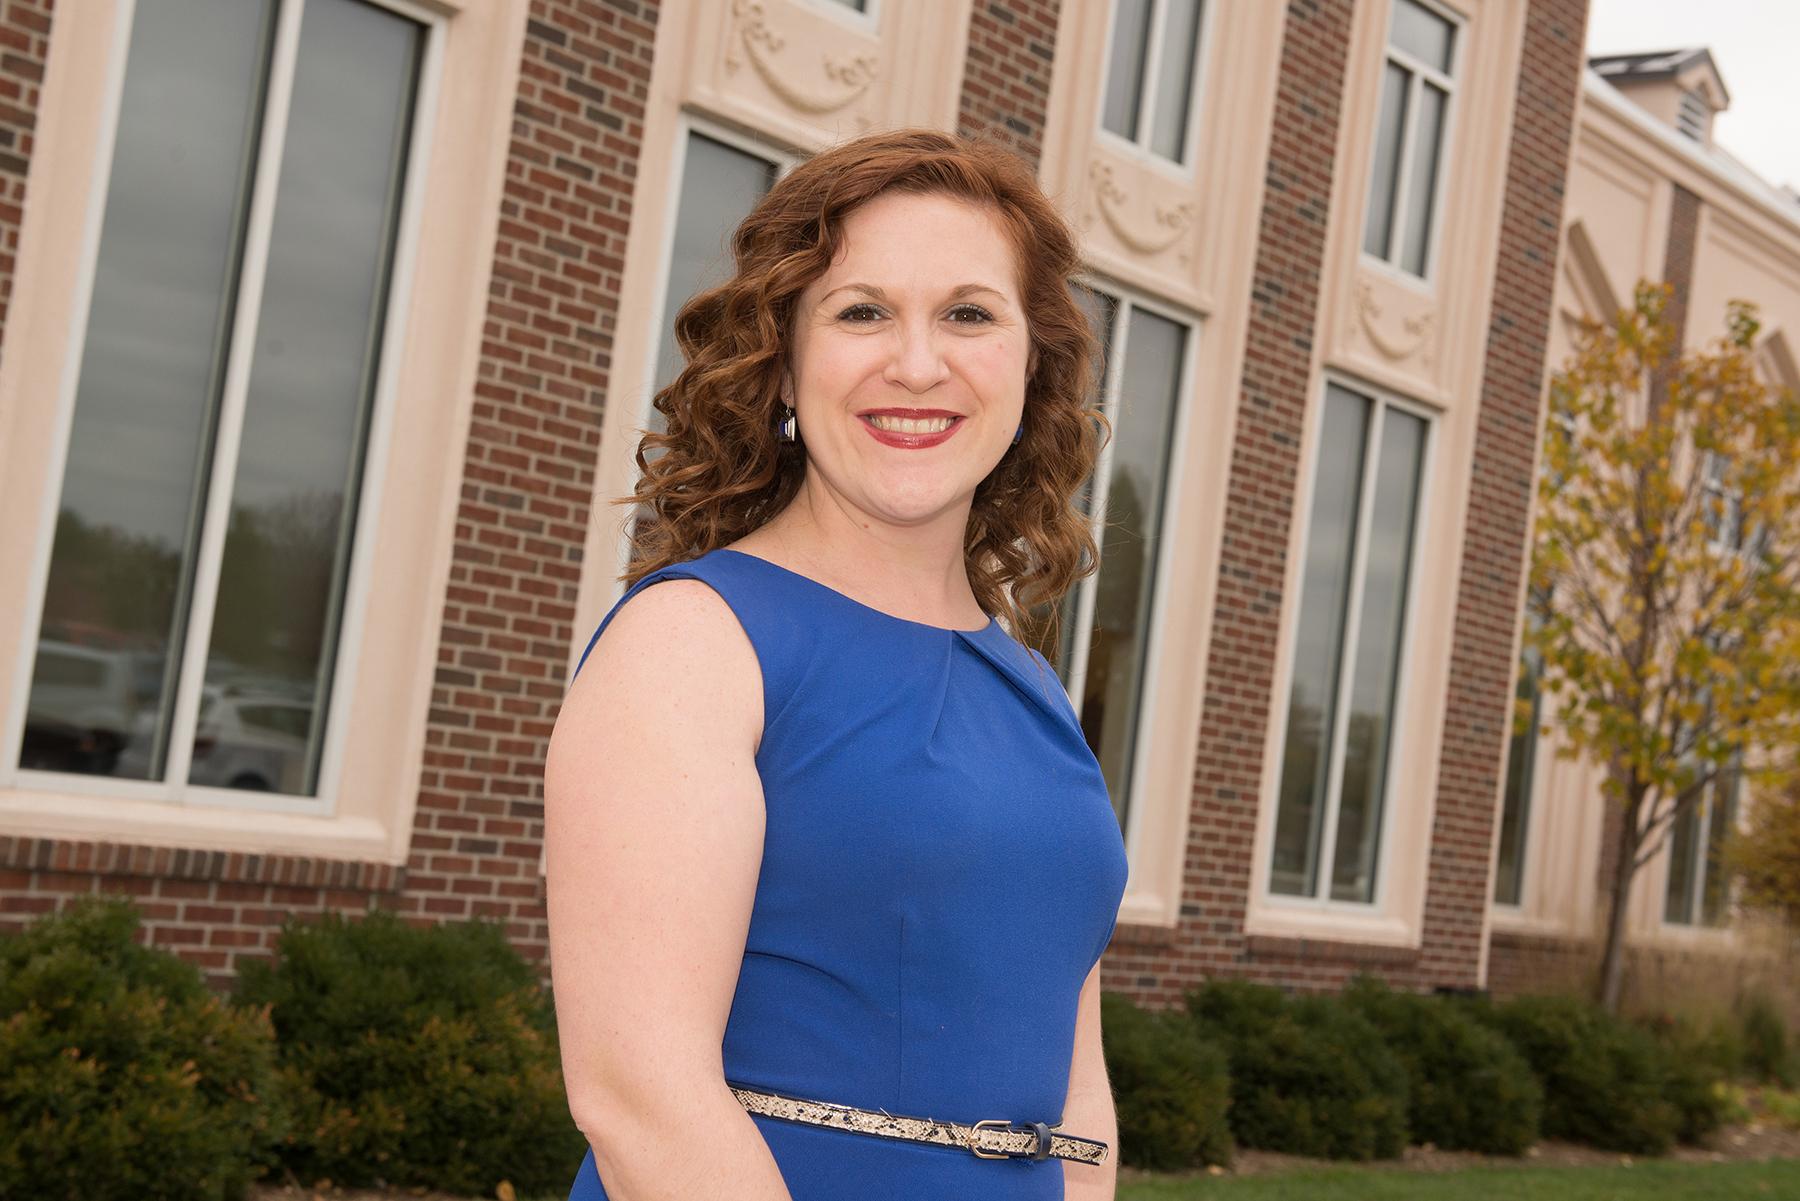 Jillian Nelson outside the Alumni Center